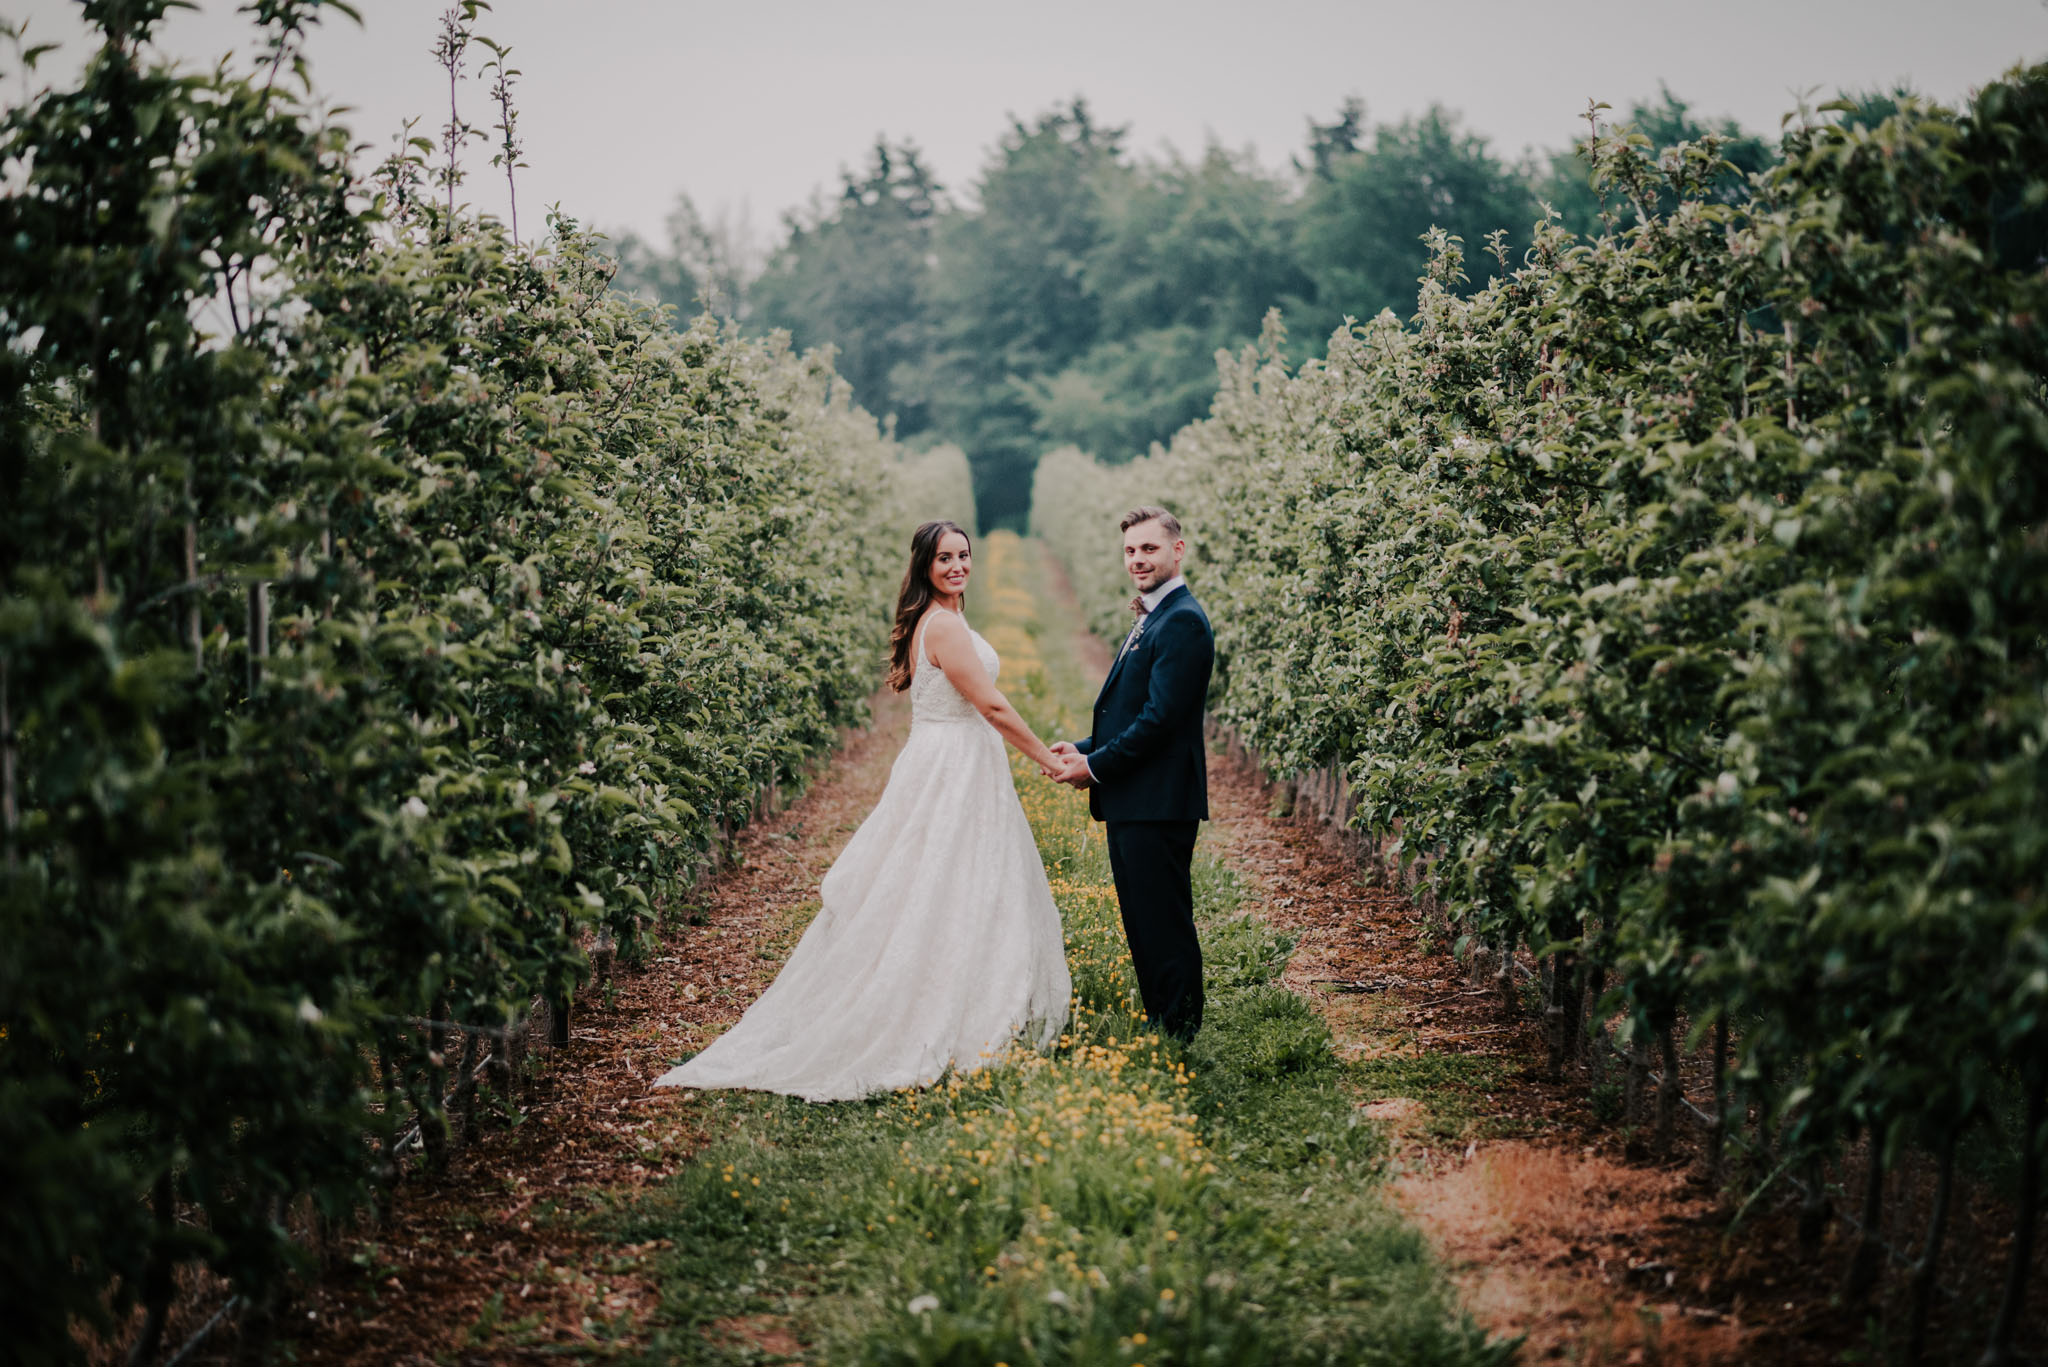 wedding-photographer-glewstone-court-hereford-scott-stockwell-photography451.jpg